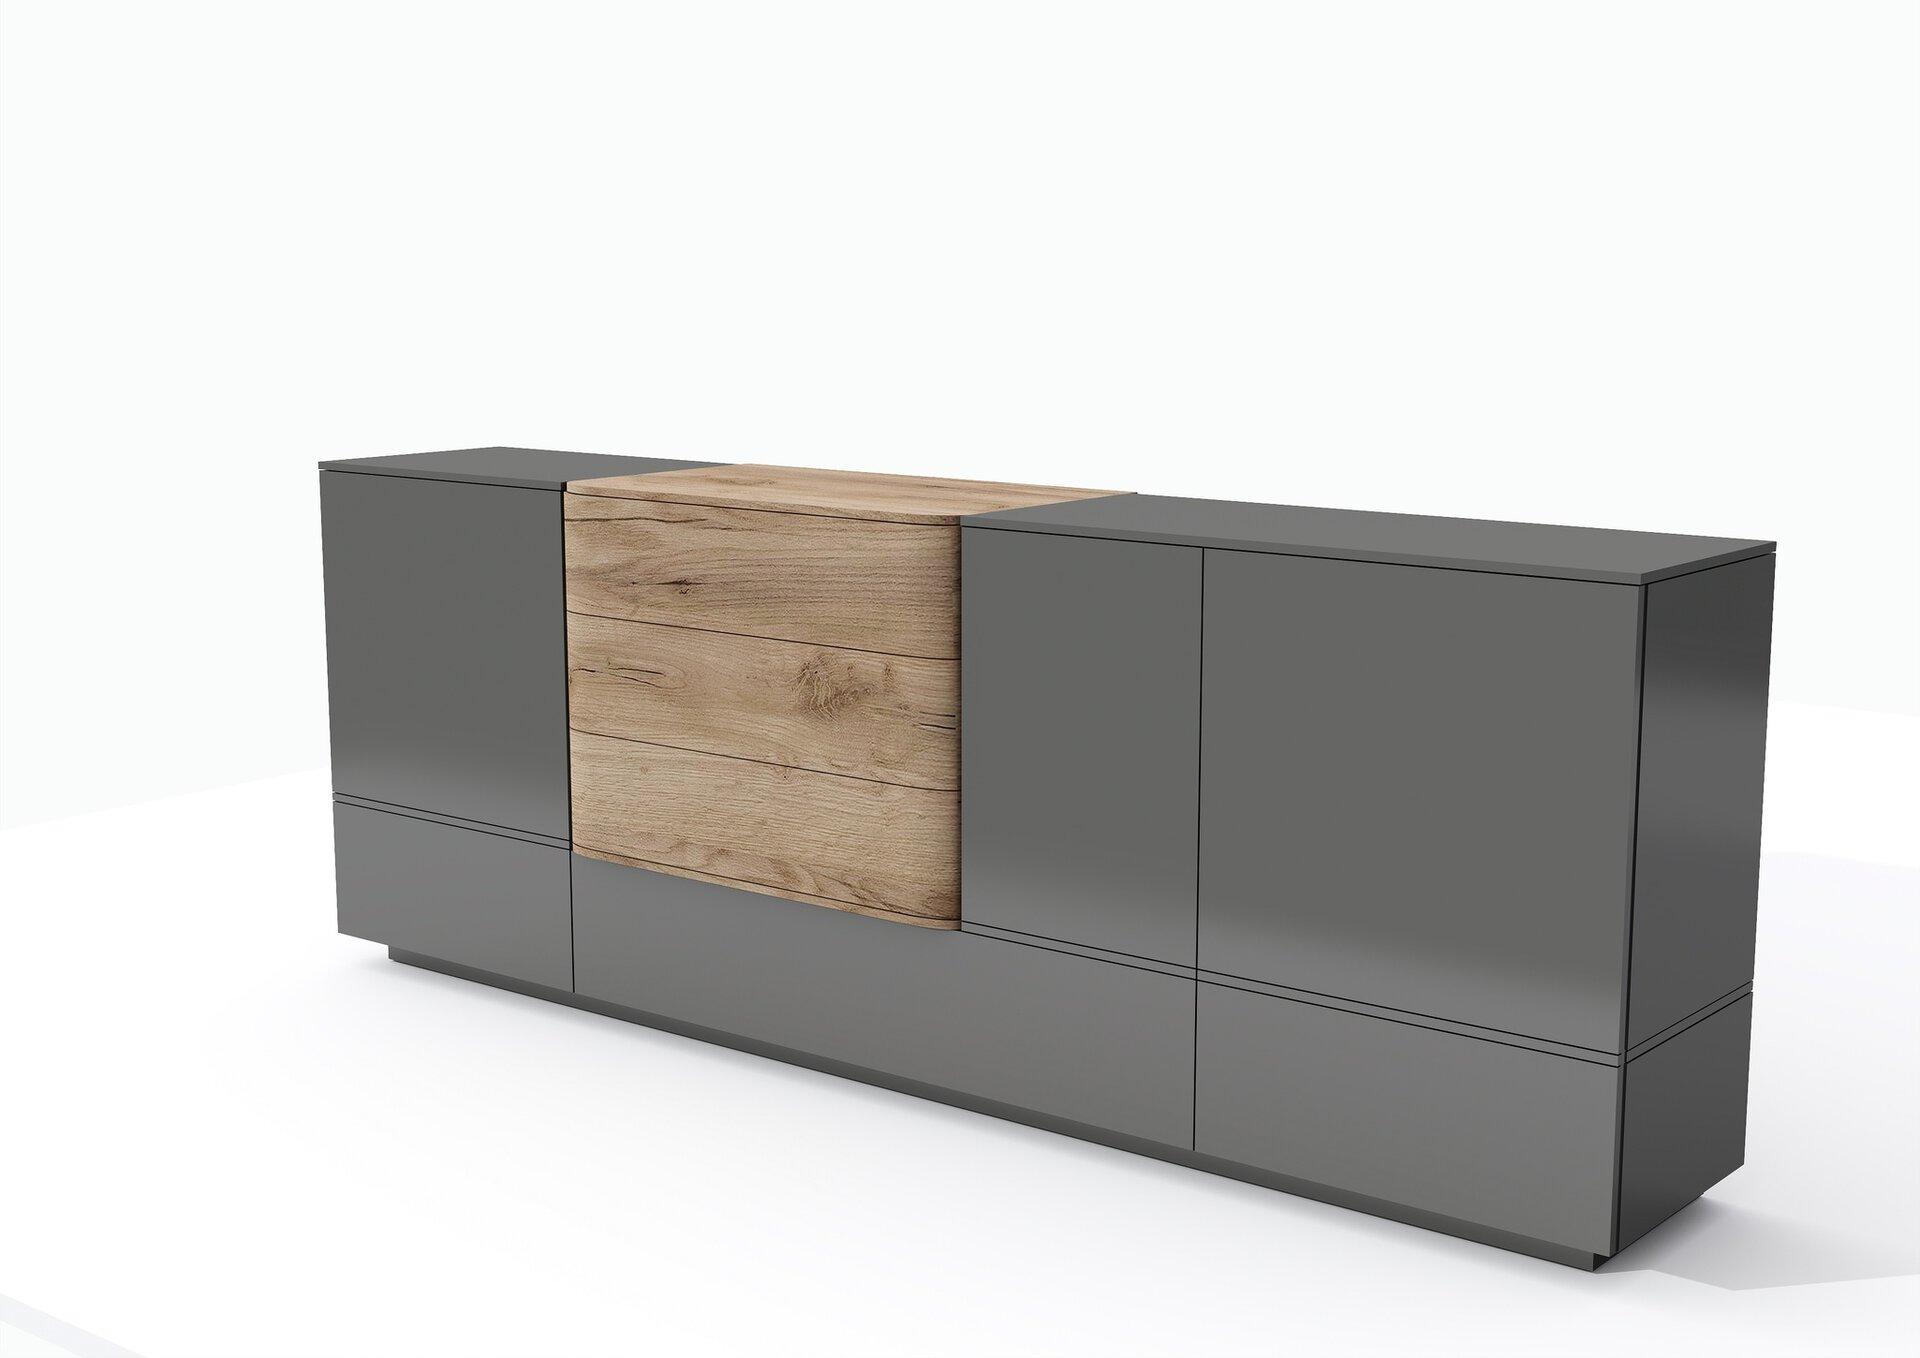 Sideboard BENVIDO MONDO Holzwerkstoff mehrfarbig 46 x 210 x 100 cm